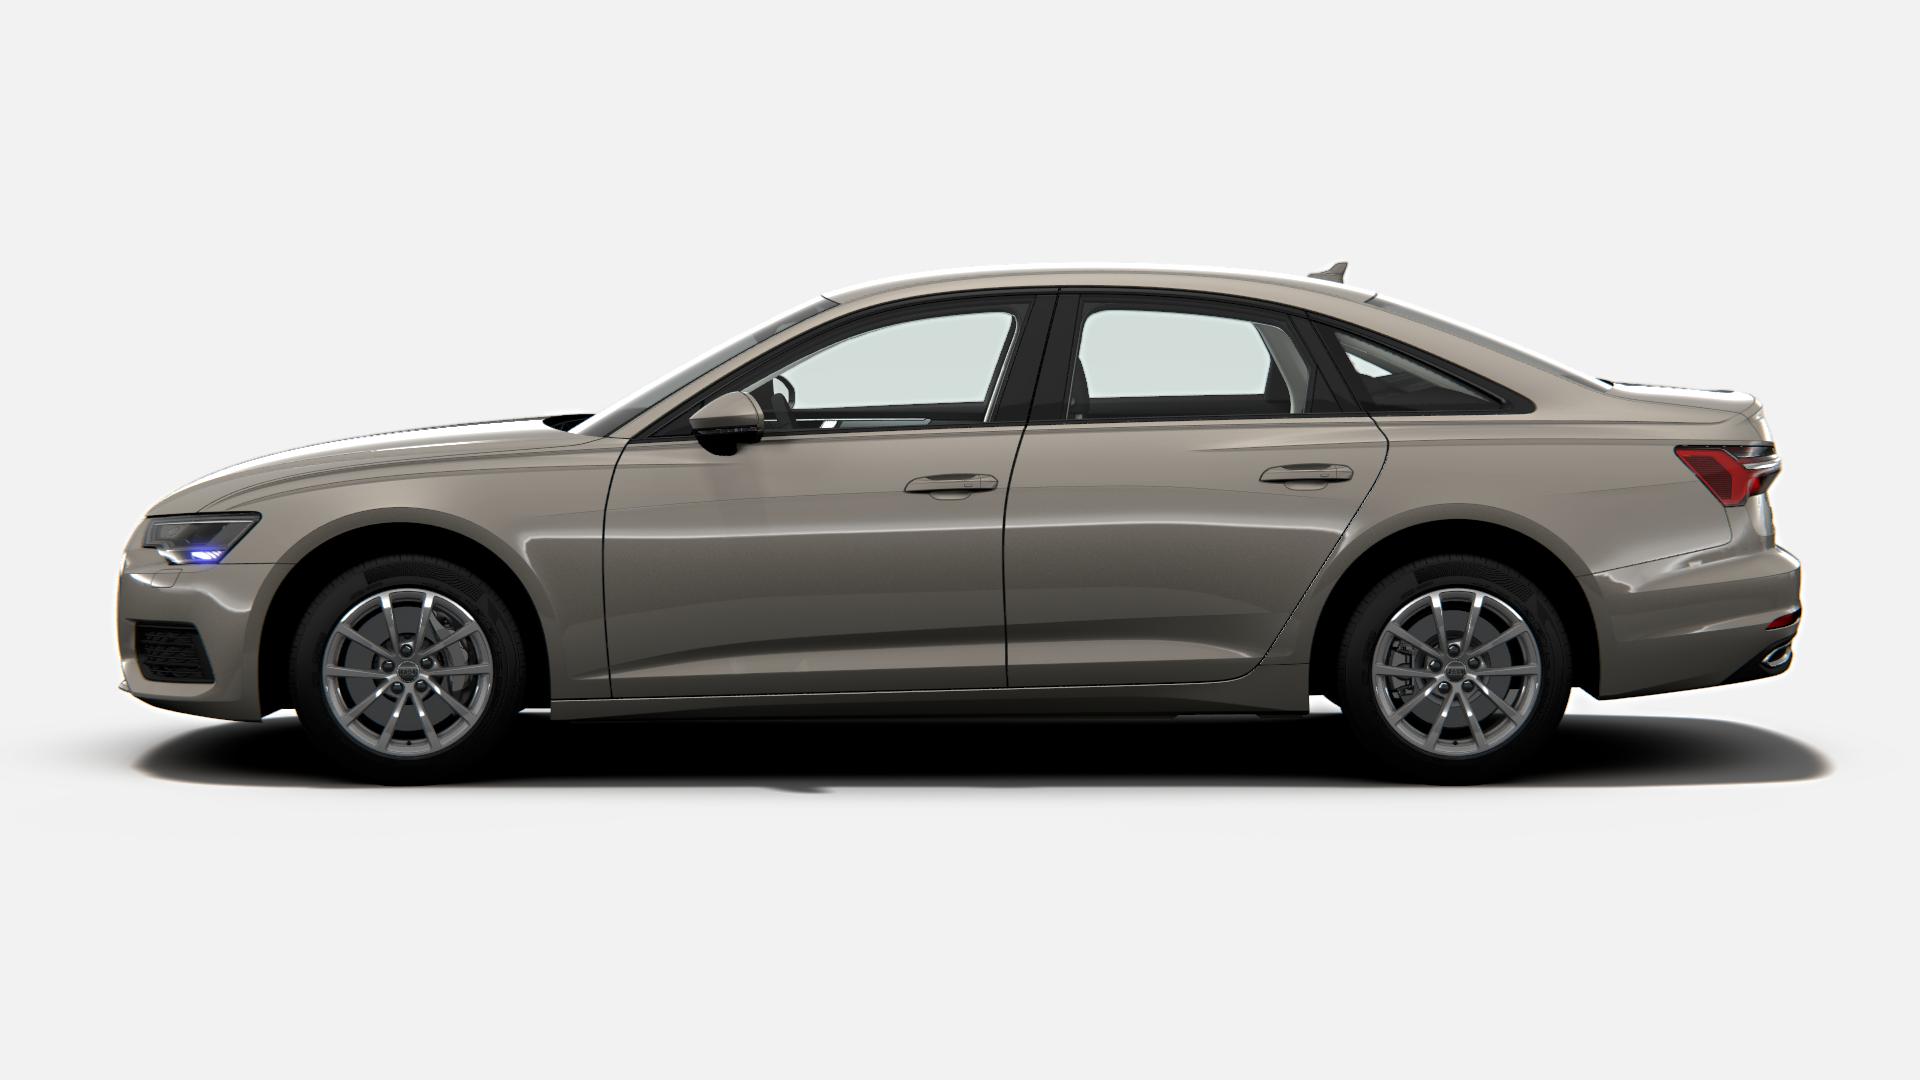 Audi A6 55 TFSI quattro  Sedan 2020